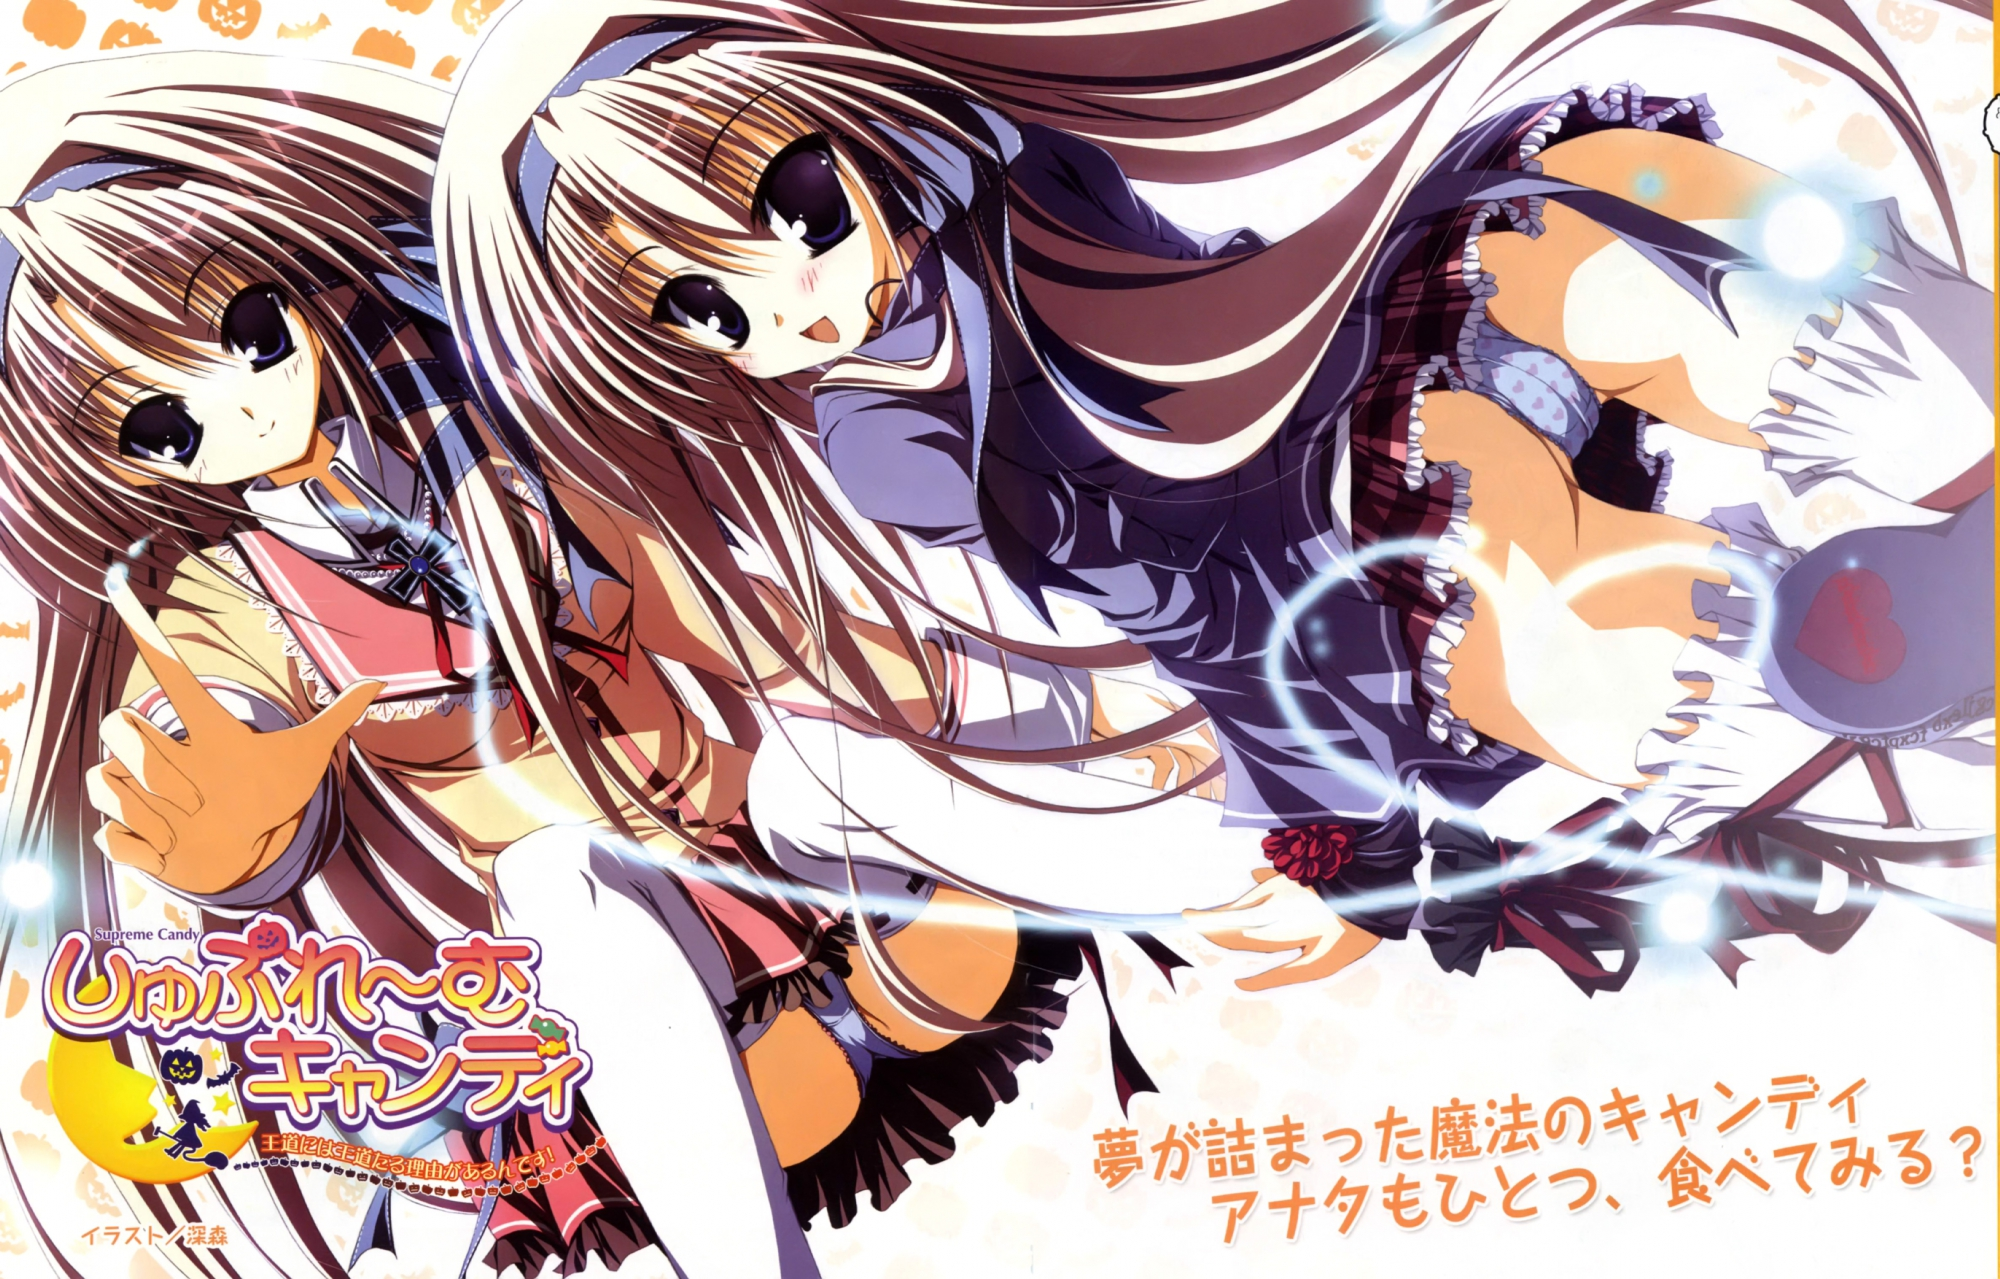 Supreme Anime Wallpaper